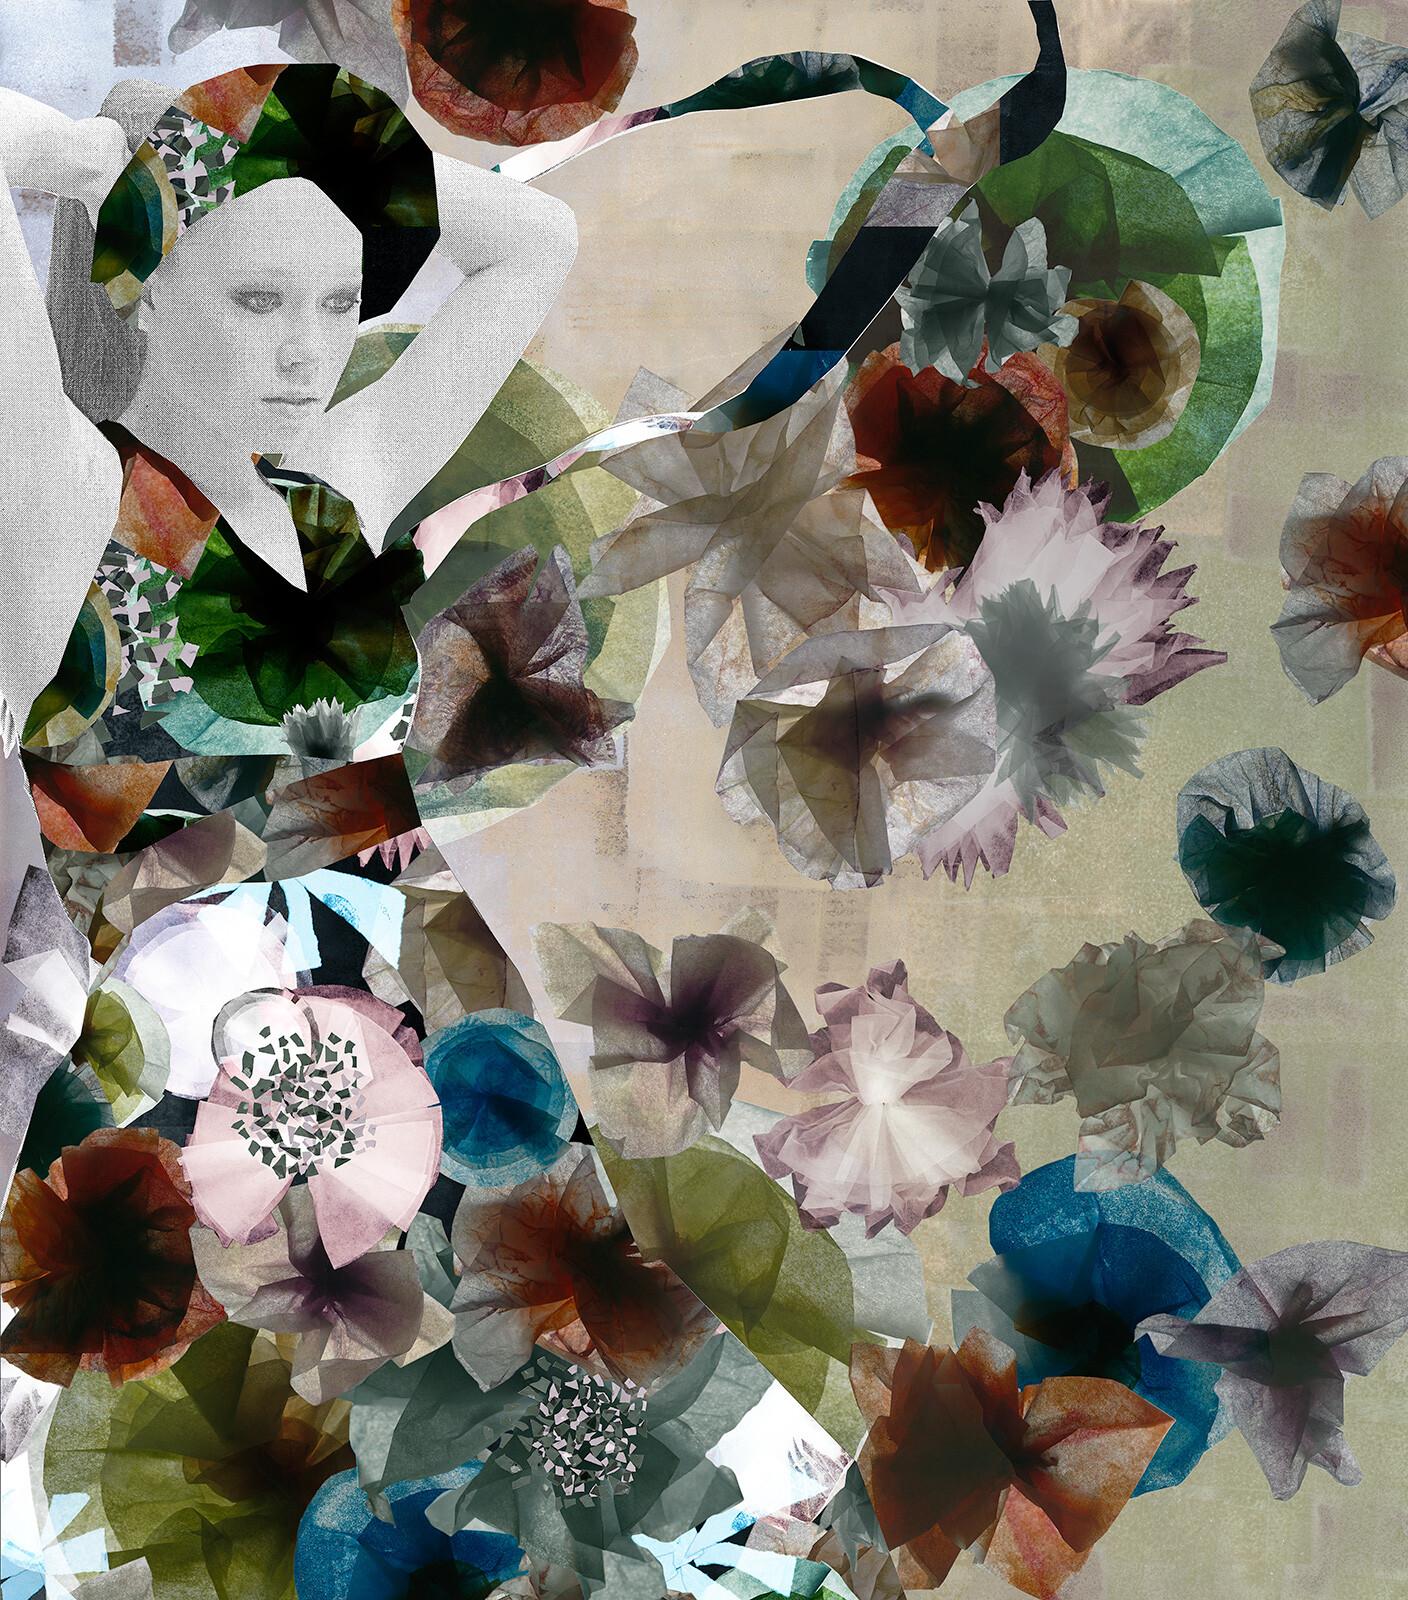 Flower dream - C.neeon